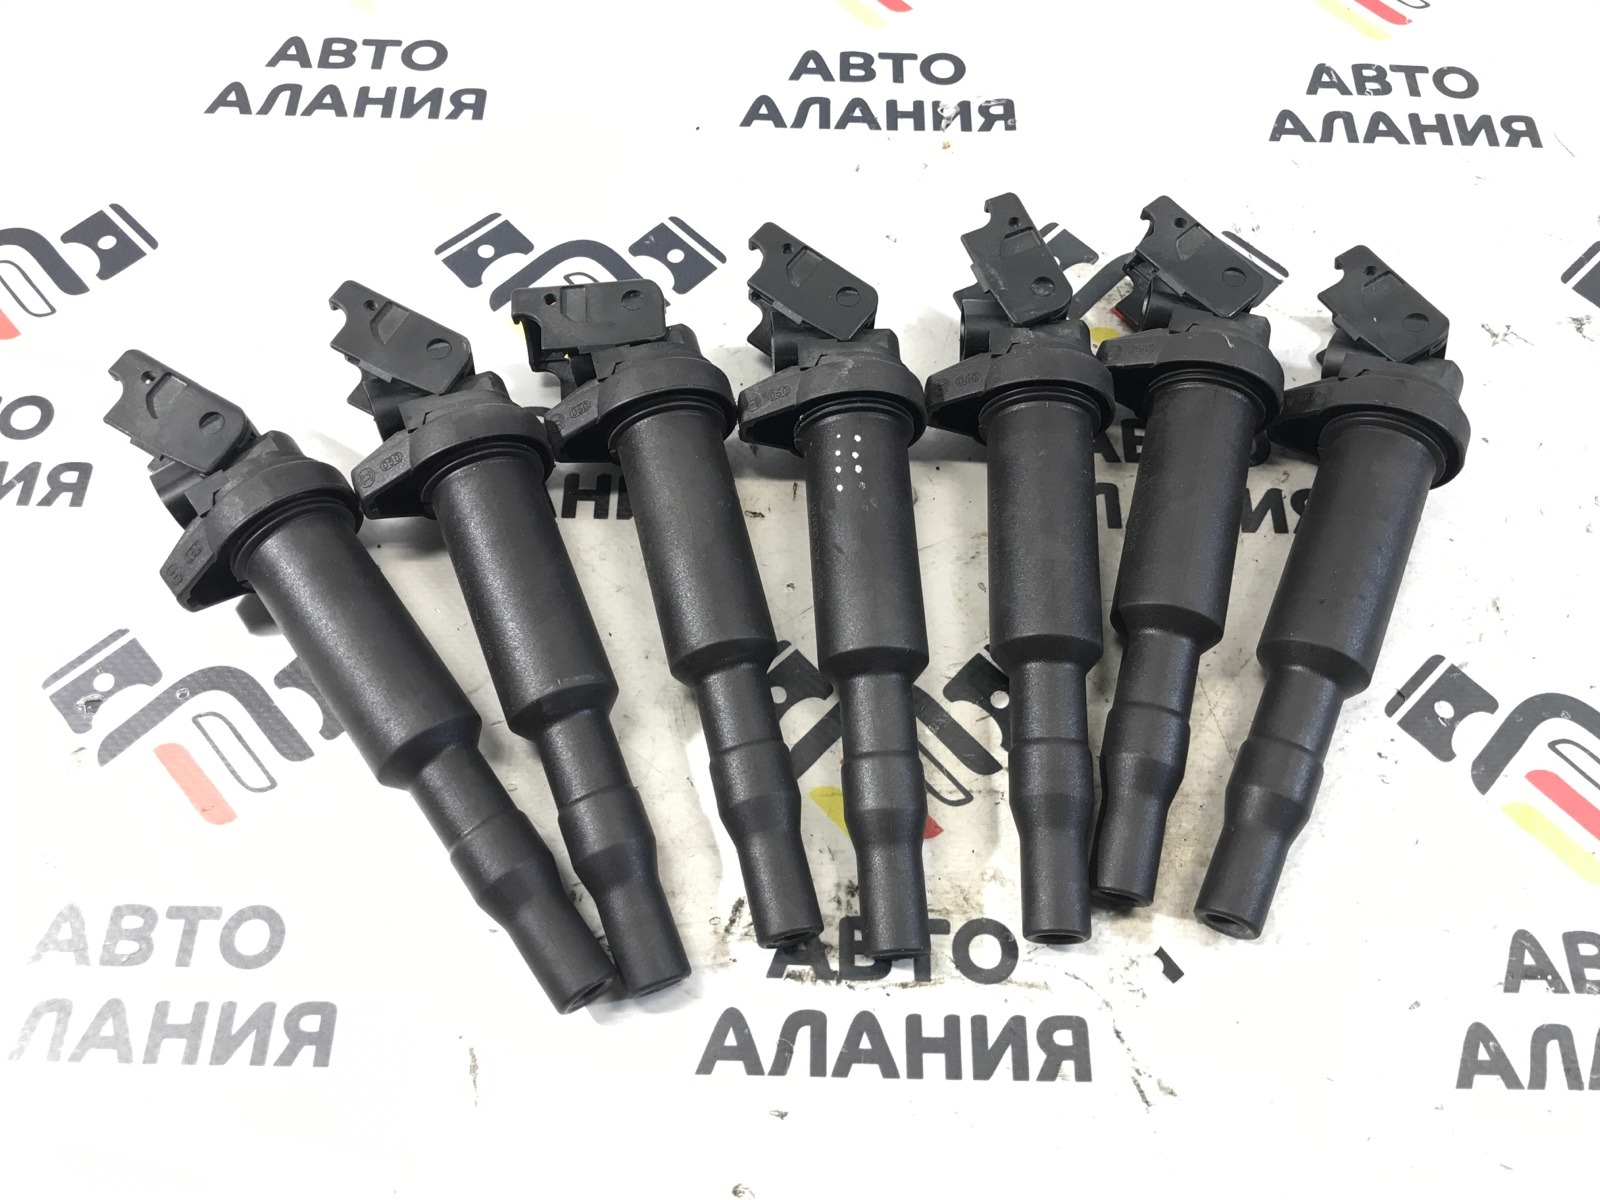 Катушка зажигания BMW 7-Series ActiveHybrid 2010 F04 N63B44 12138616153 контрактная